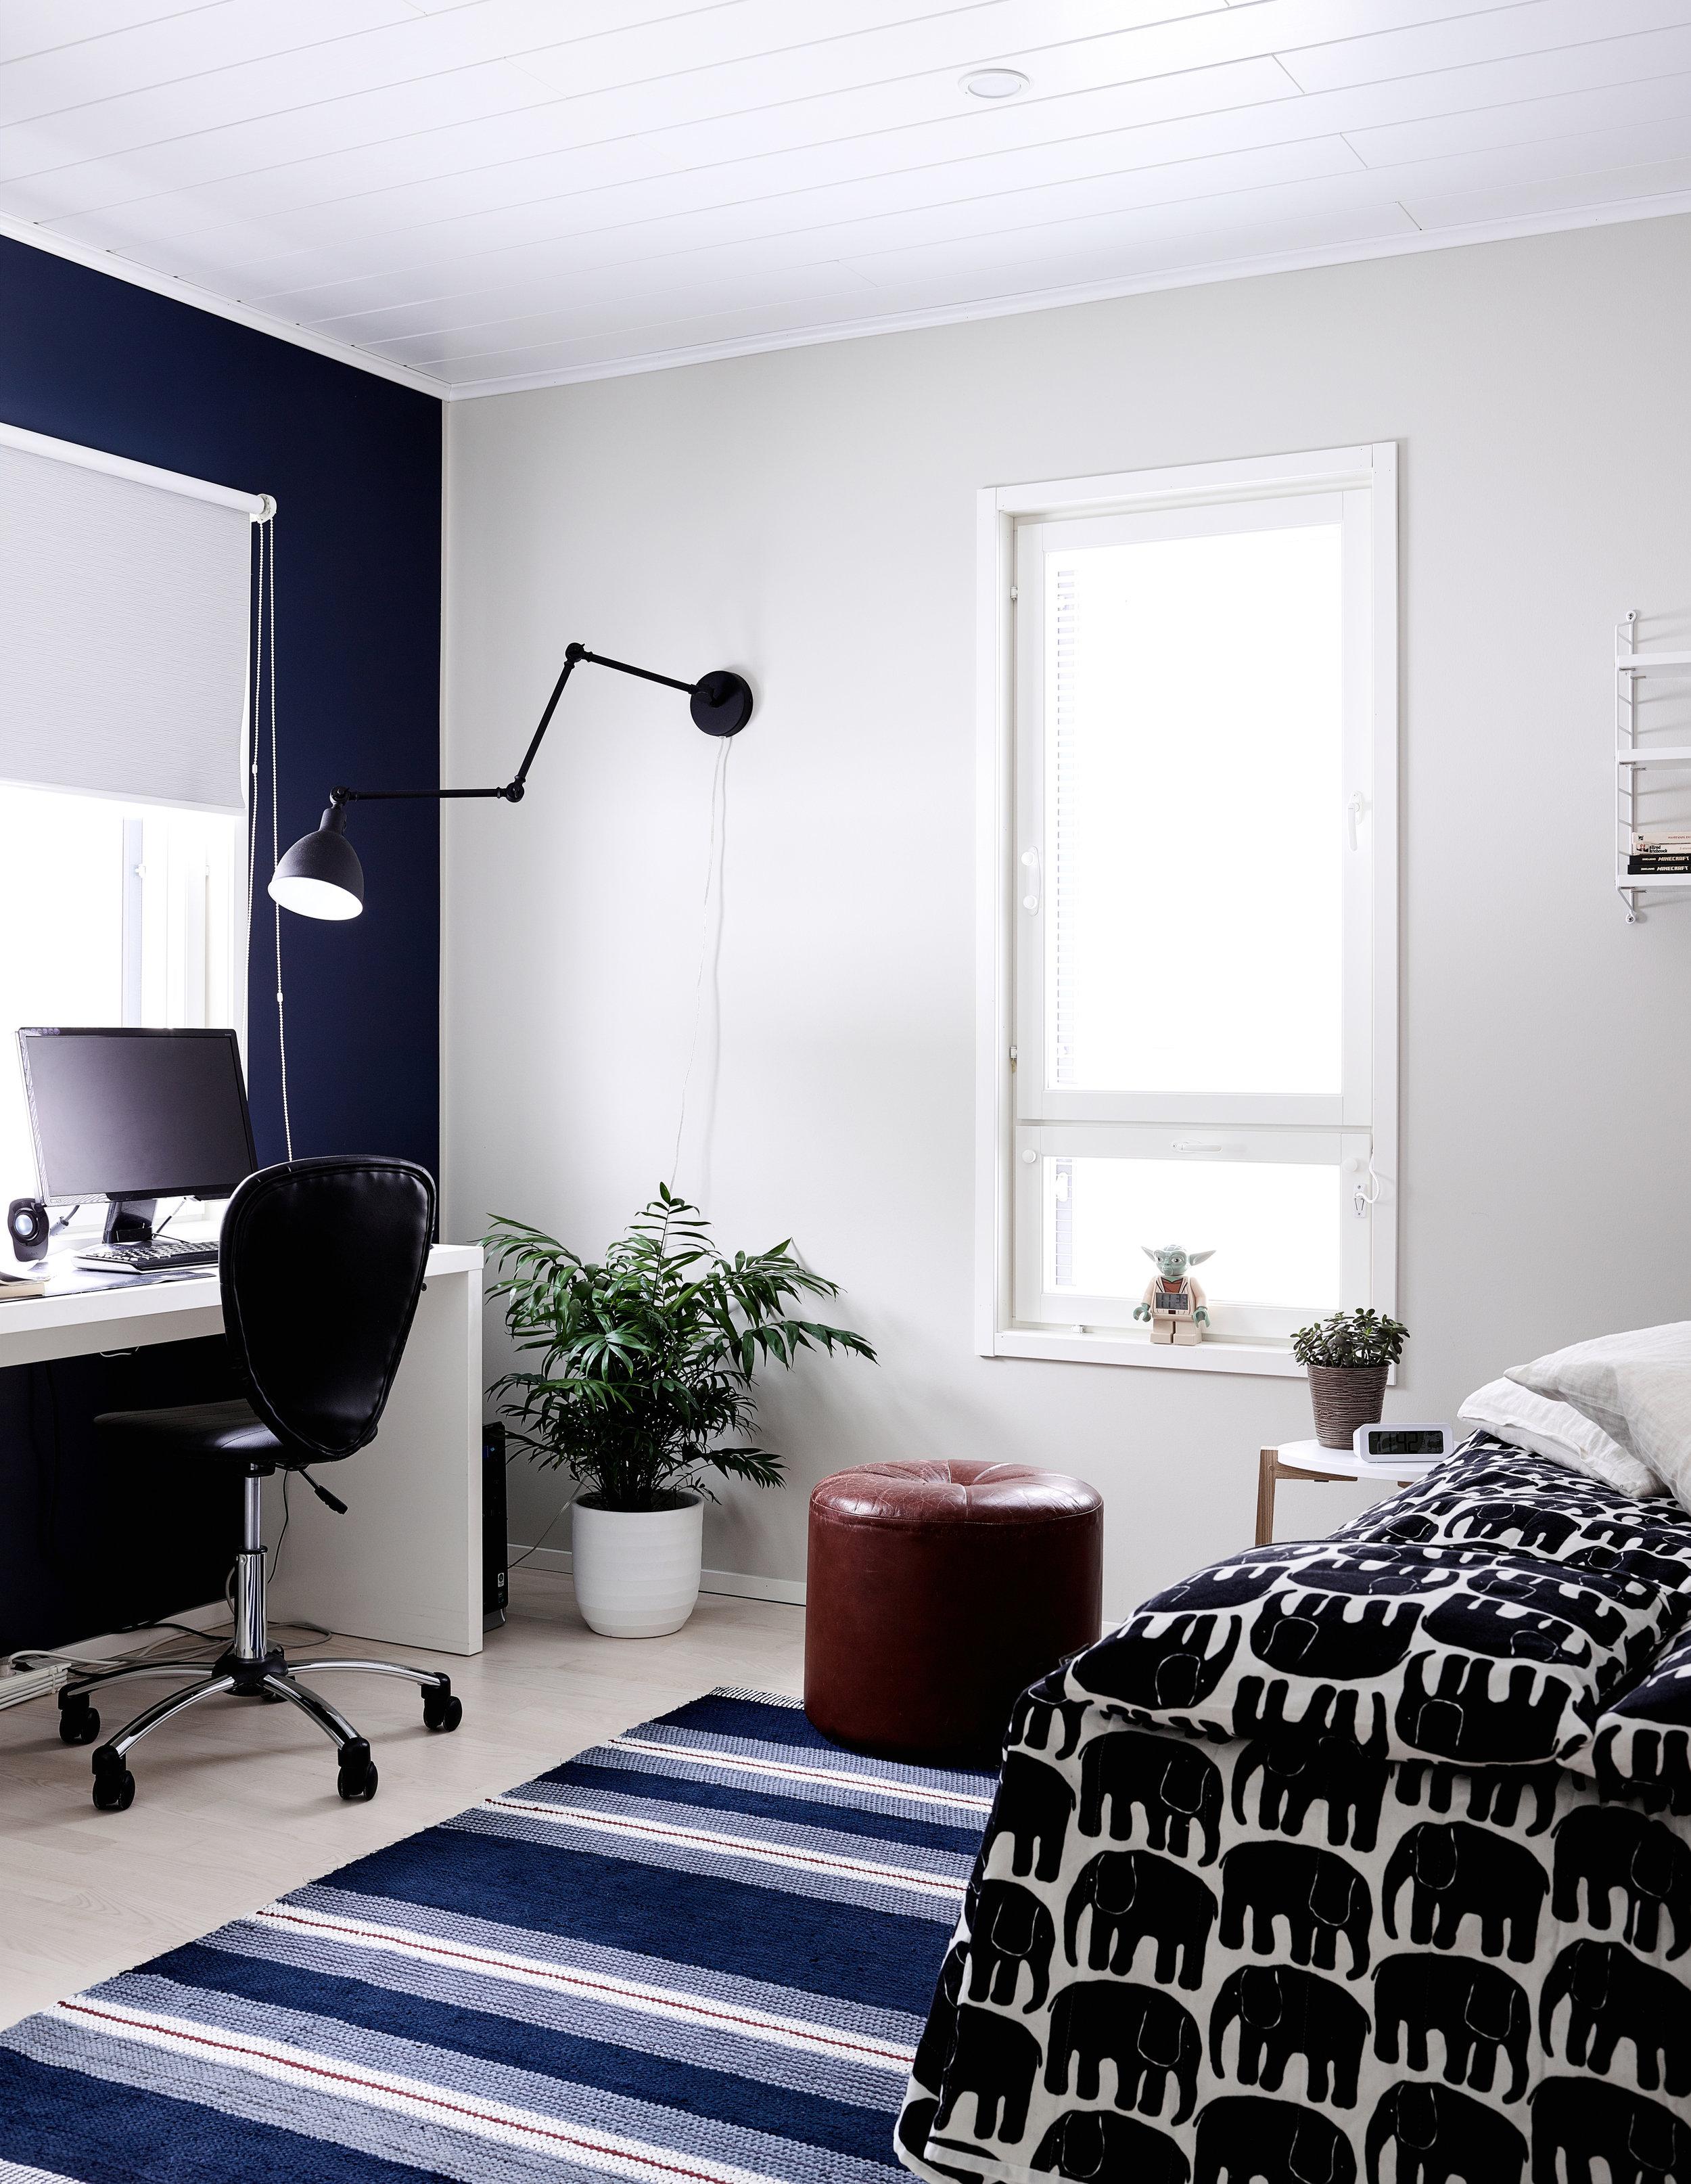 interior-anna-koponen-photo-krista-keltanen-11.jpg